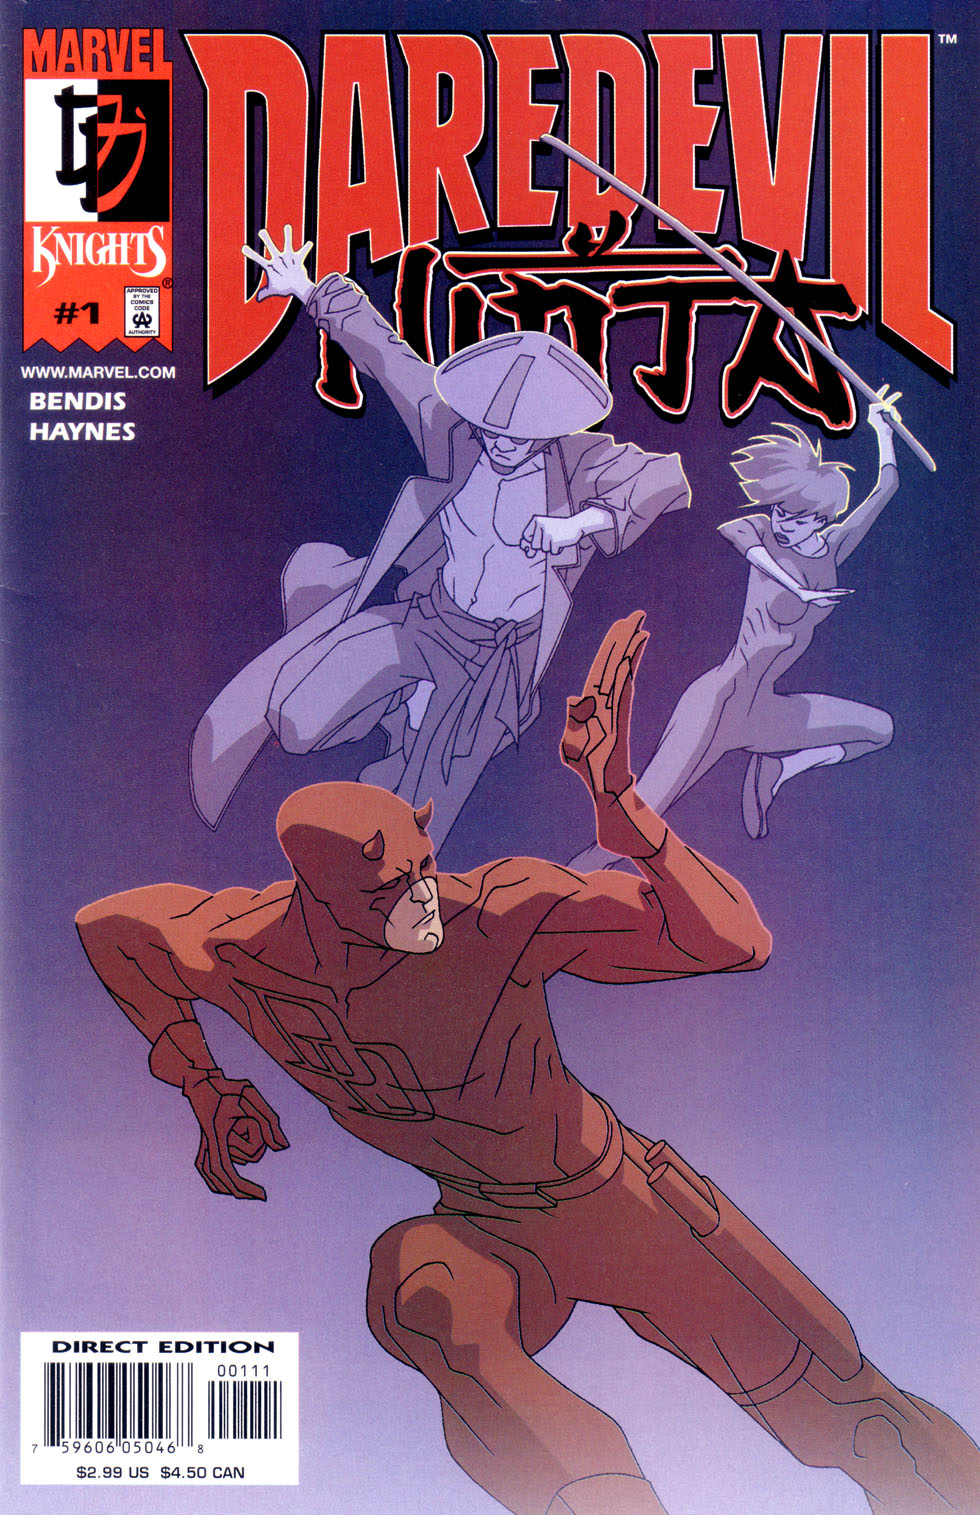 Supermans Pal Jimmy Olsen (1954) Daredevil_-_Ninja_(2001) Page 1